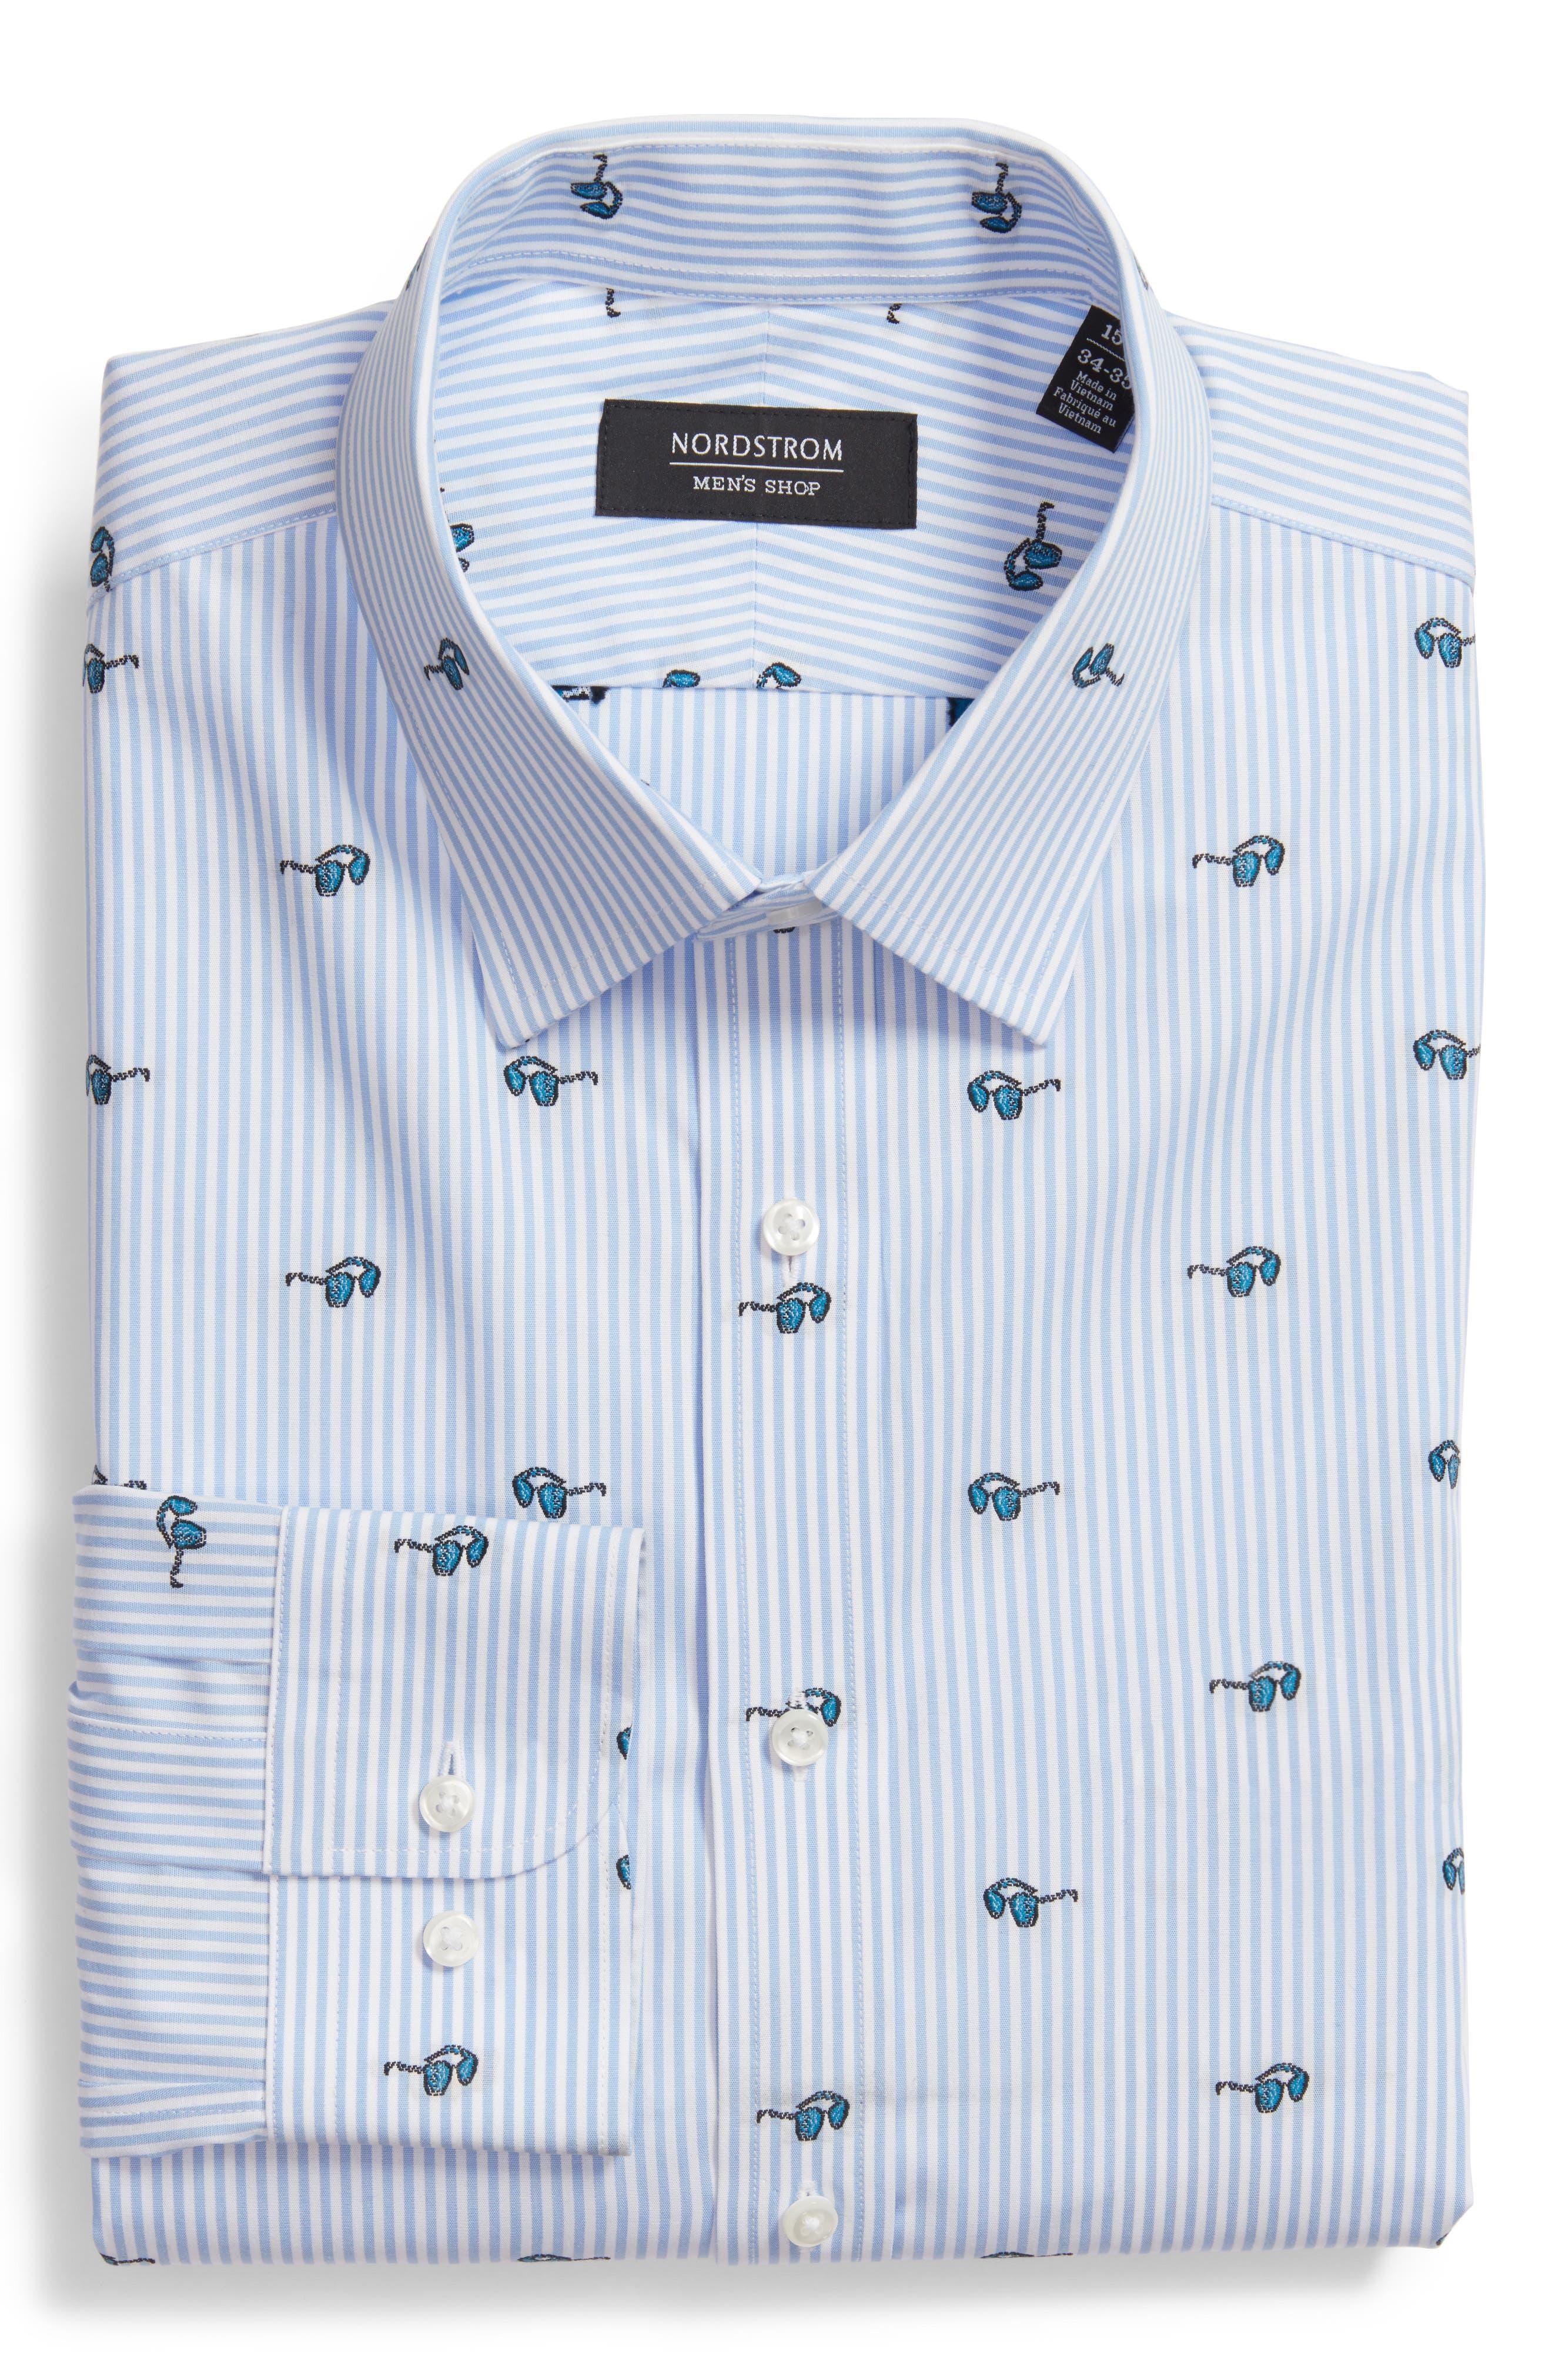 Main Image - Nordstrom Men's Shop Trim Fit Sunglasses Print Dress Shirt